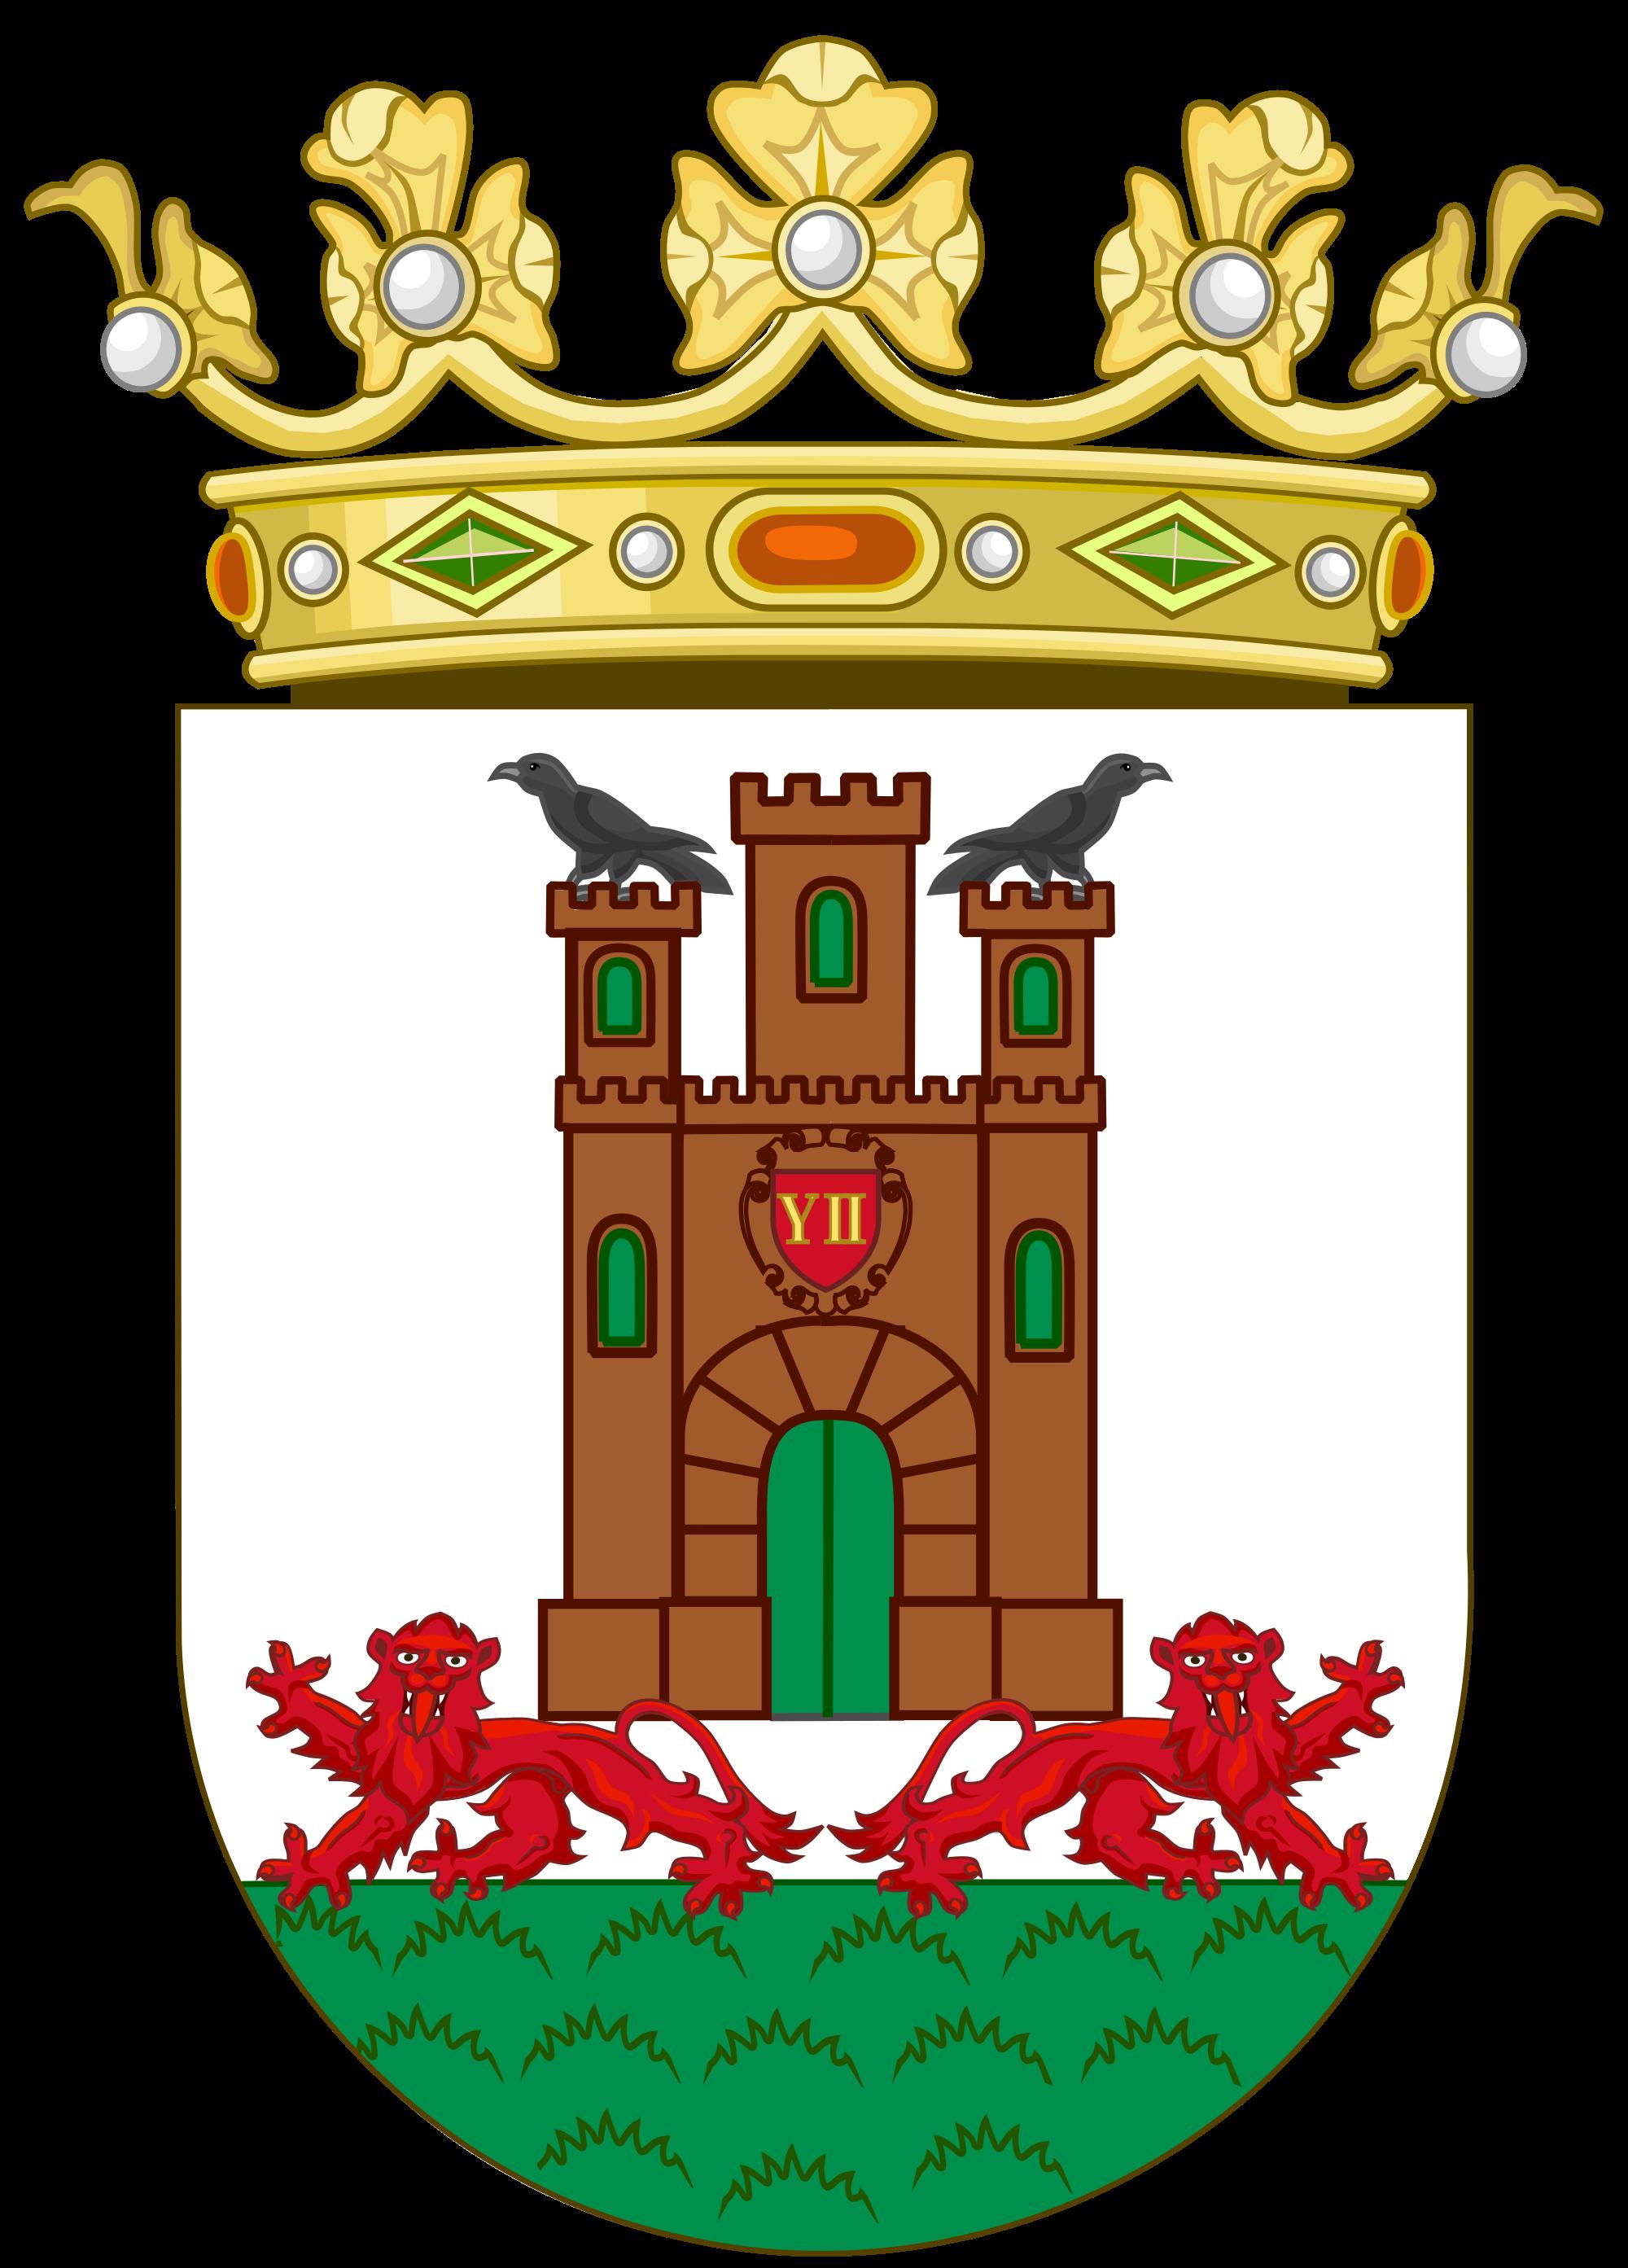 File:Coat of Arms of Vitoria.